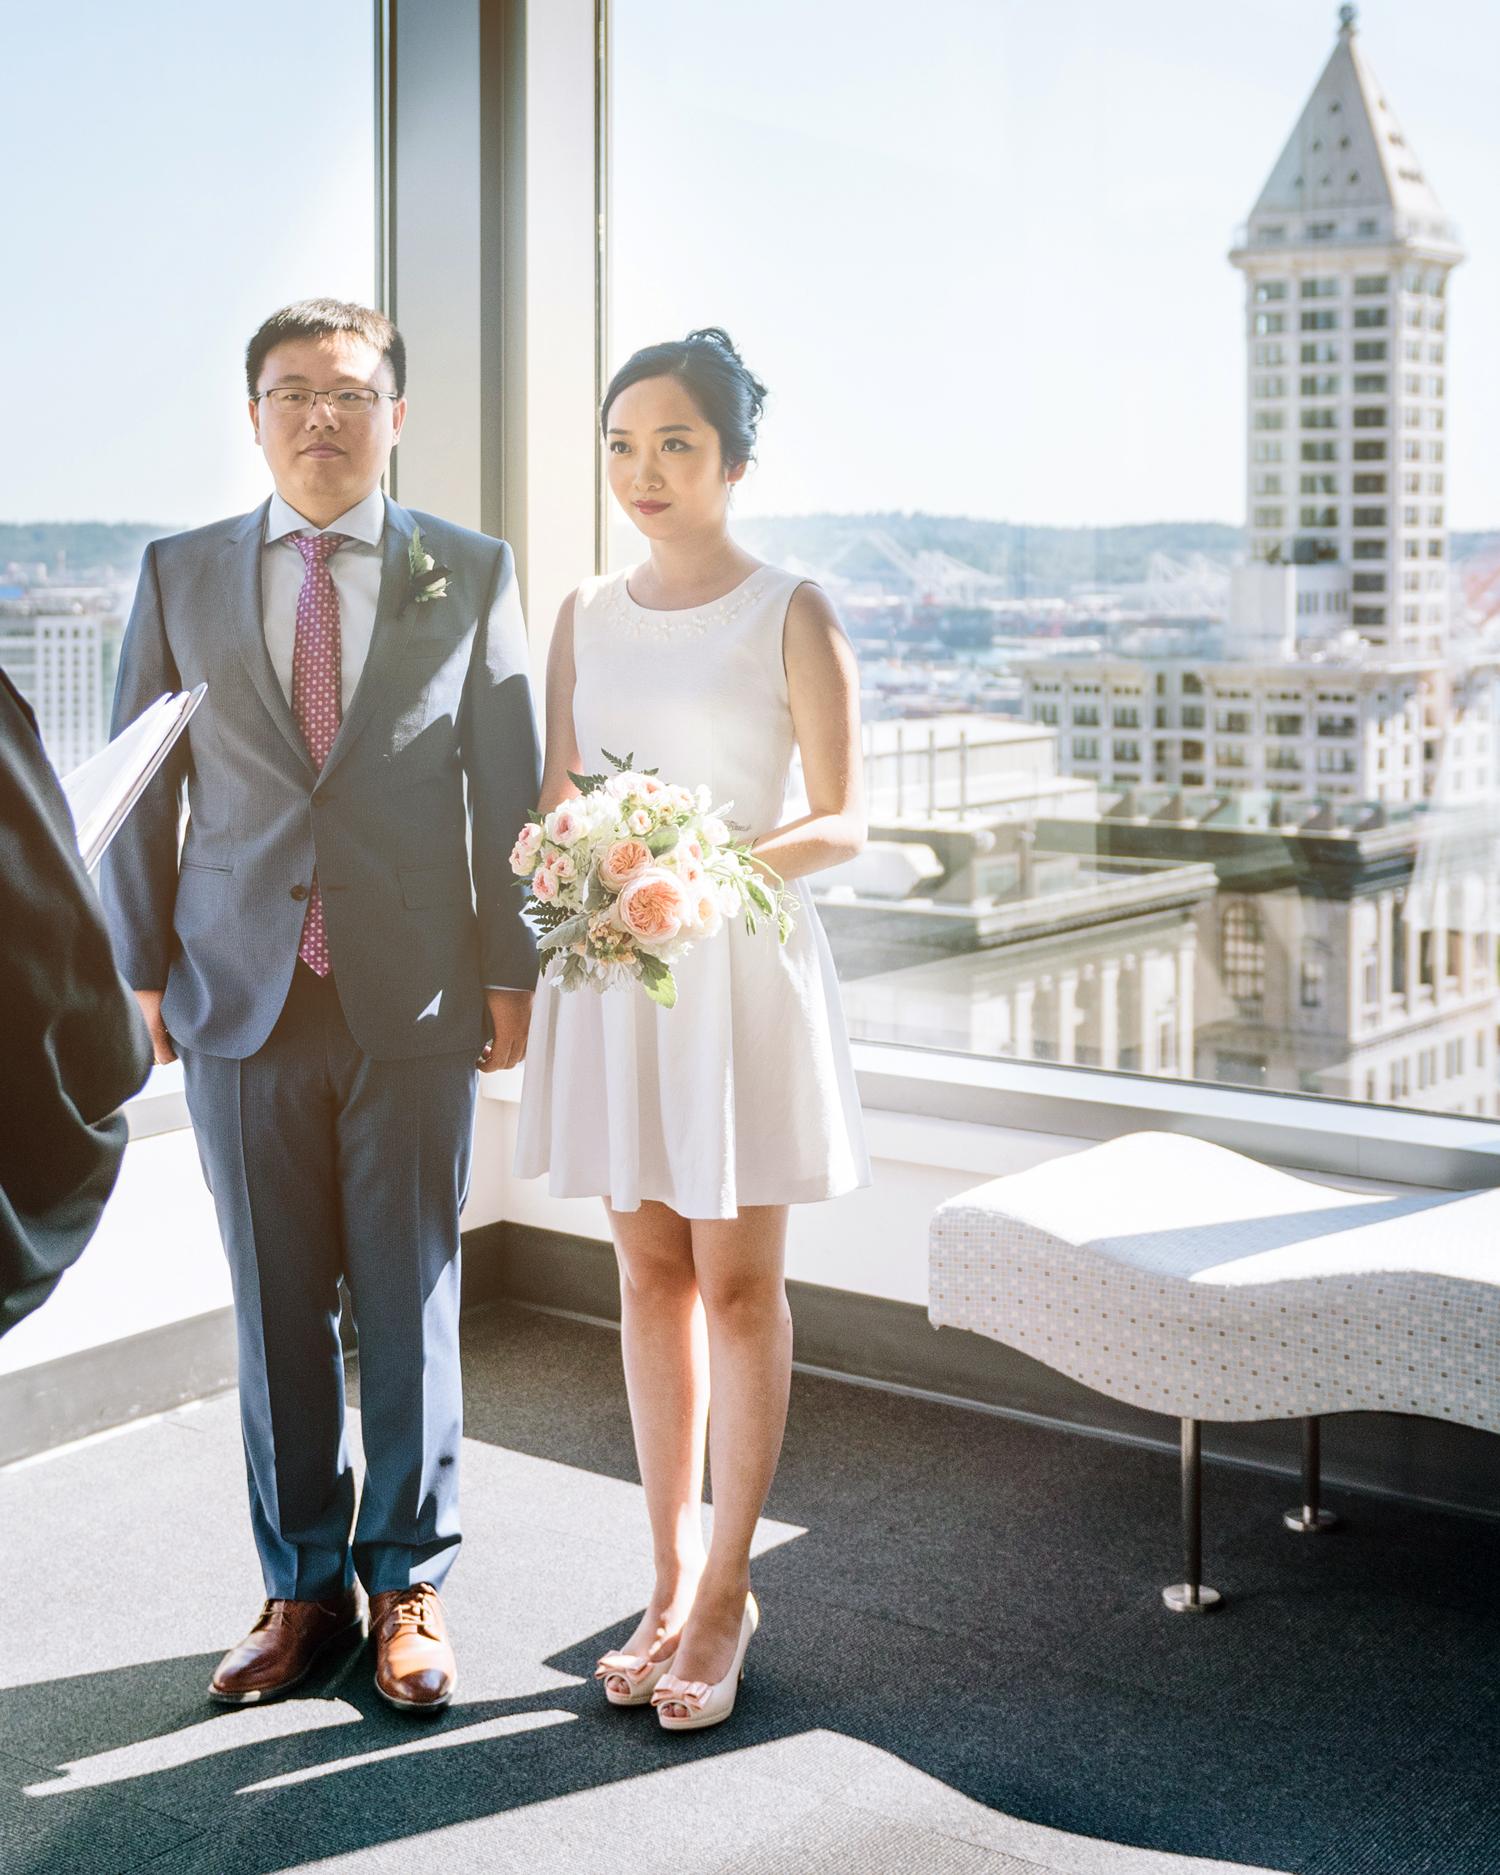 city hall wedding ceremony in seattle city hall